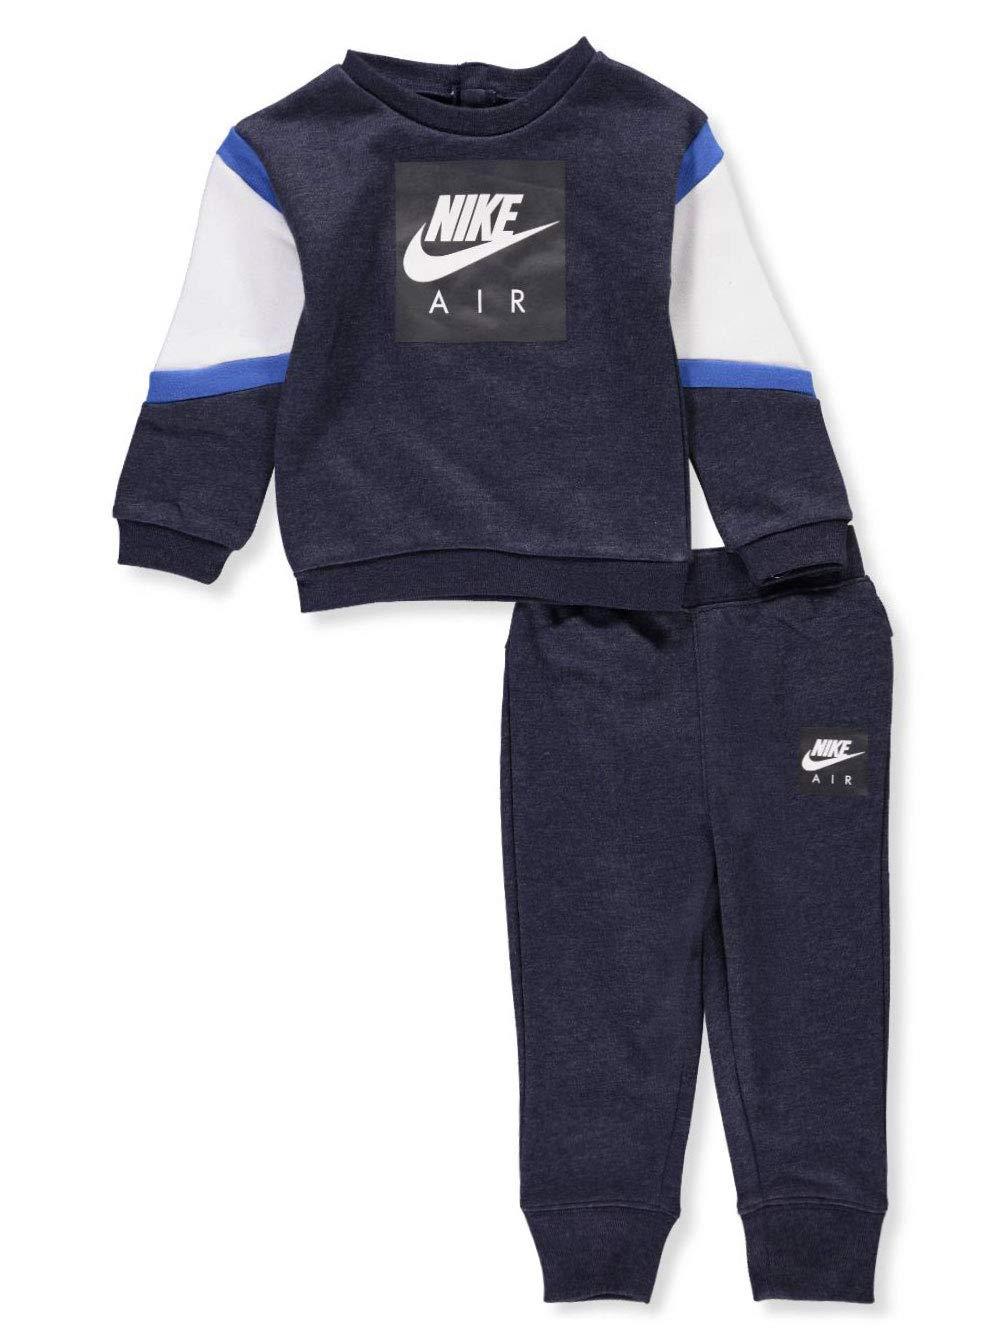 NIKE Baby Boys' 2-Piece Sweatsuit Pants Set - Obsidian Heather, 18 Months